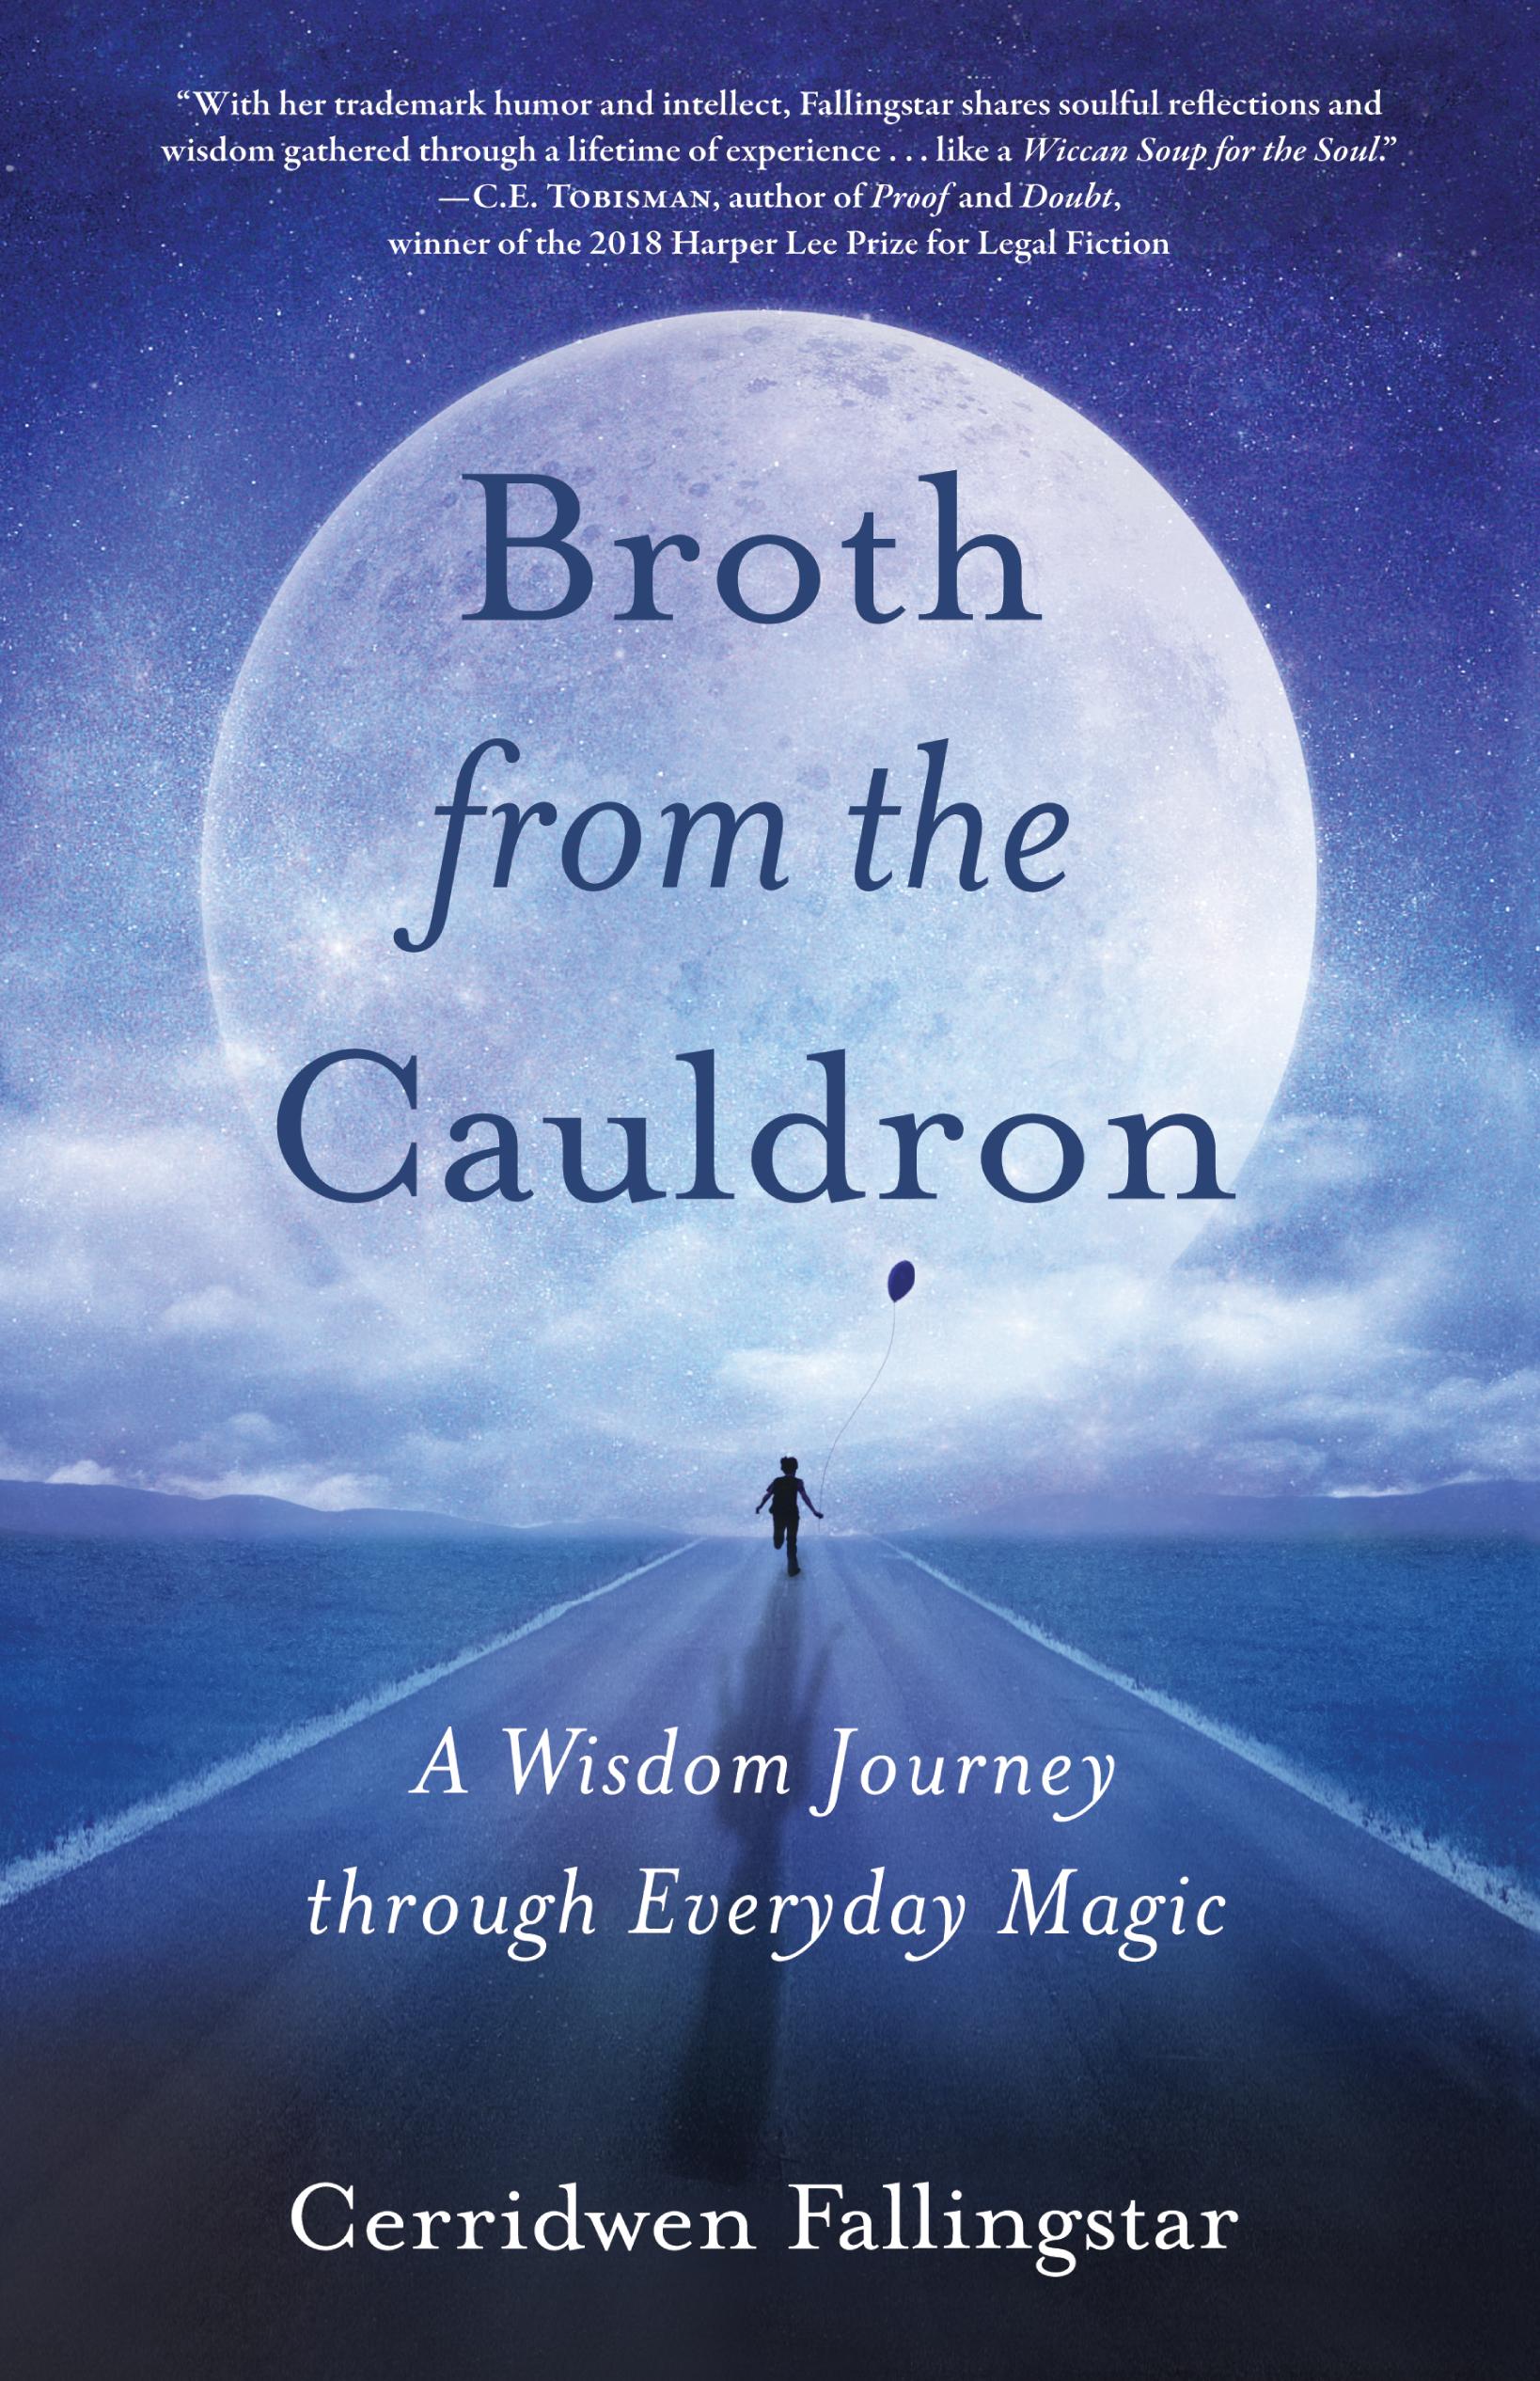 Broth from the Cauldron: A Wisdom Journey through Everyday Magic